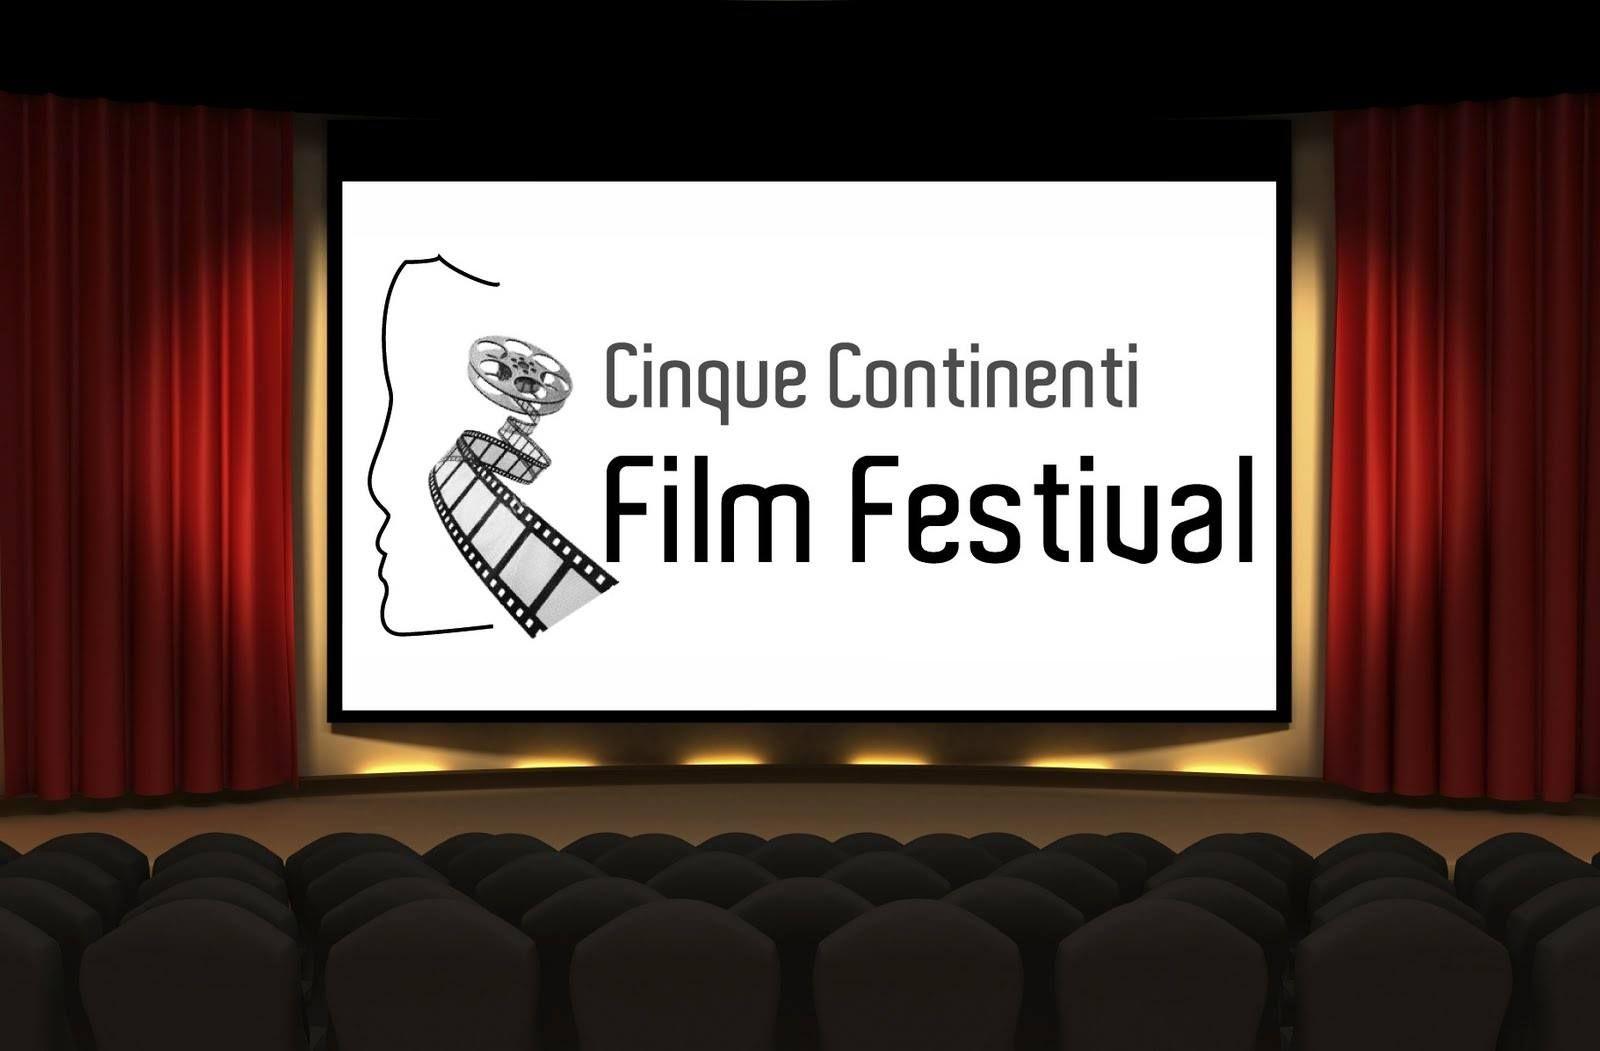 film_festival_theater